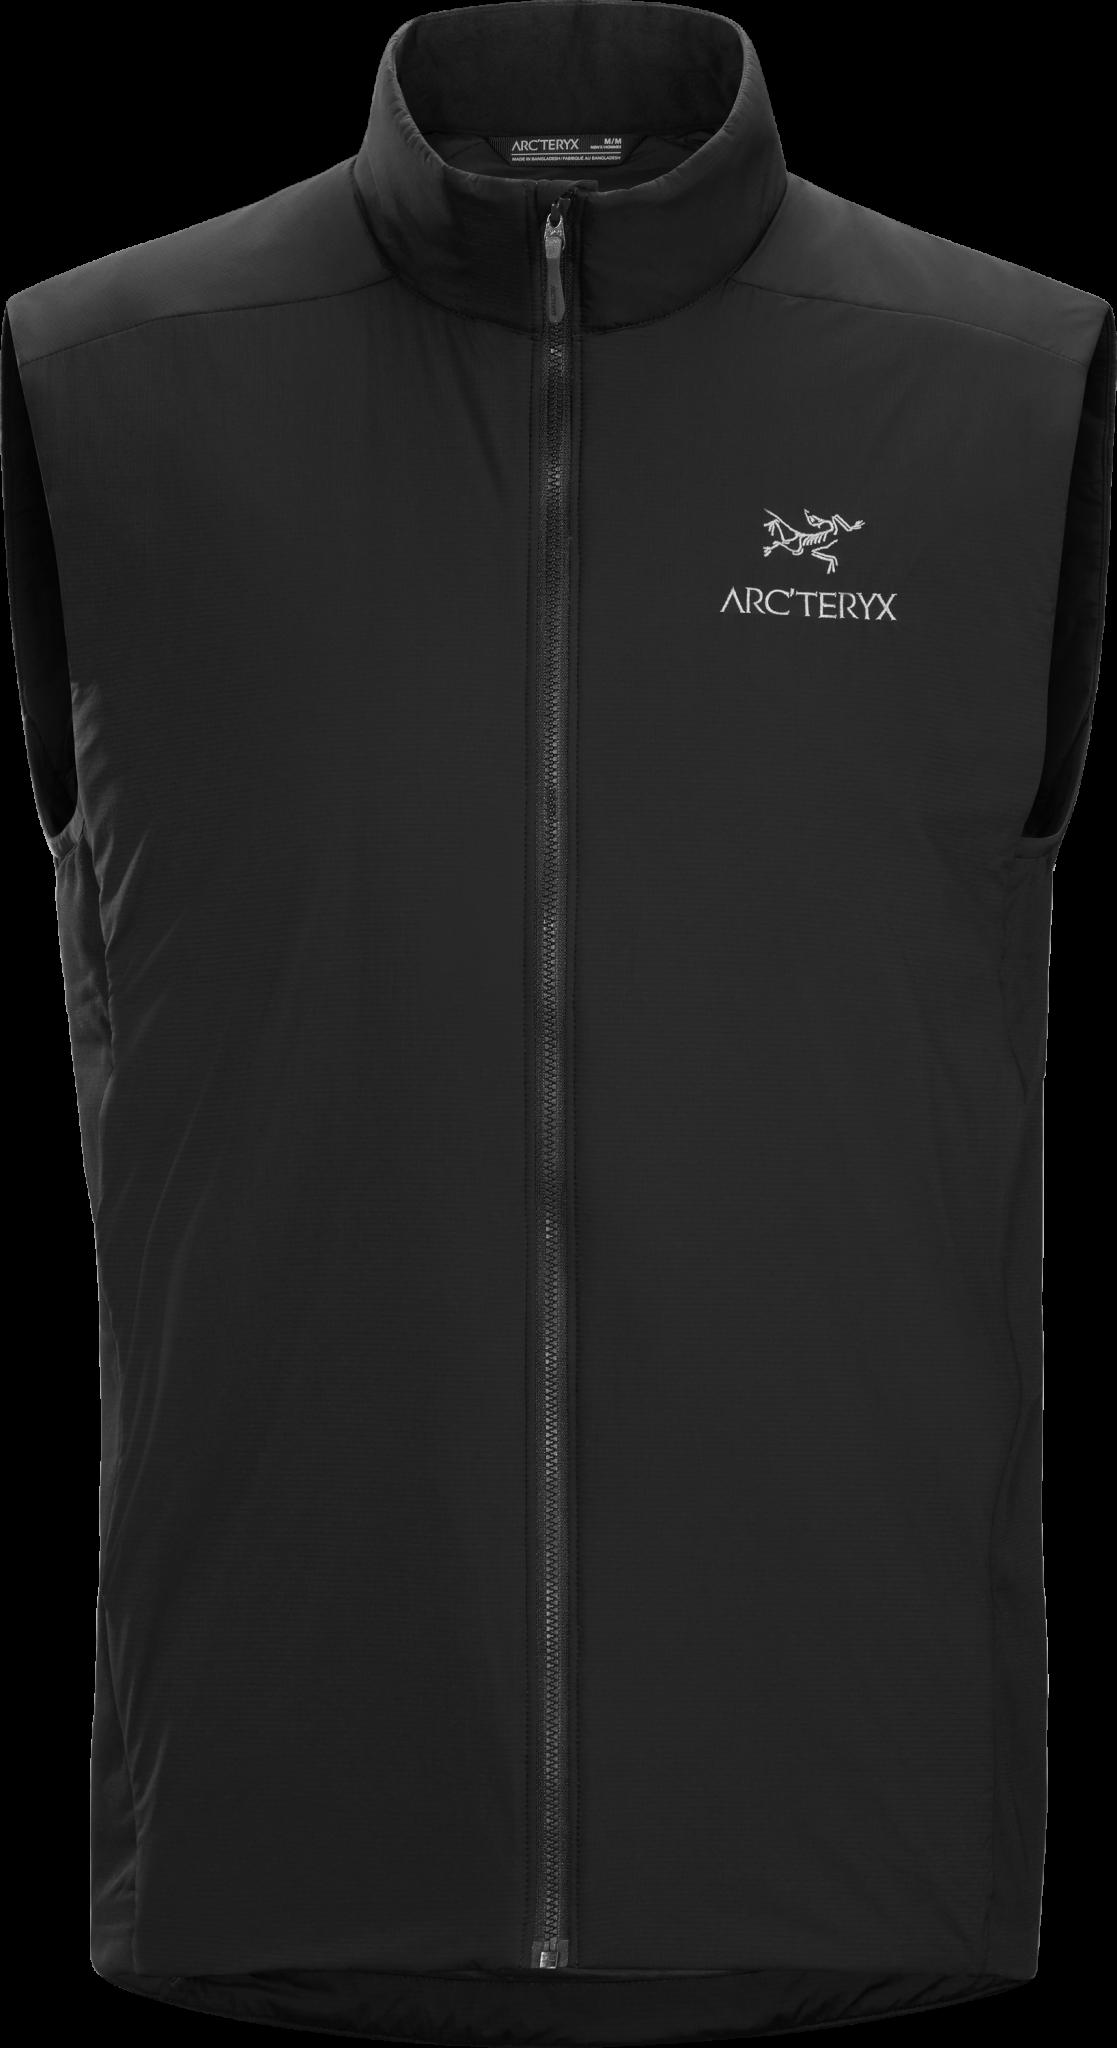 Arc'teryx Atom LT Vest Men's-1